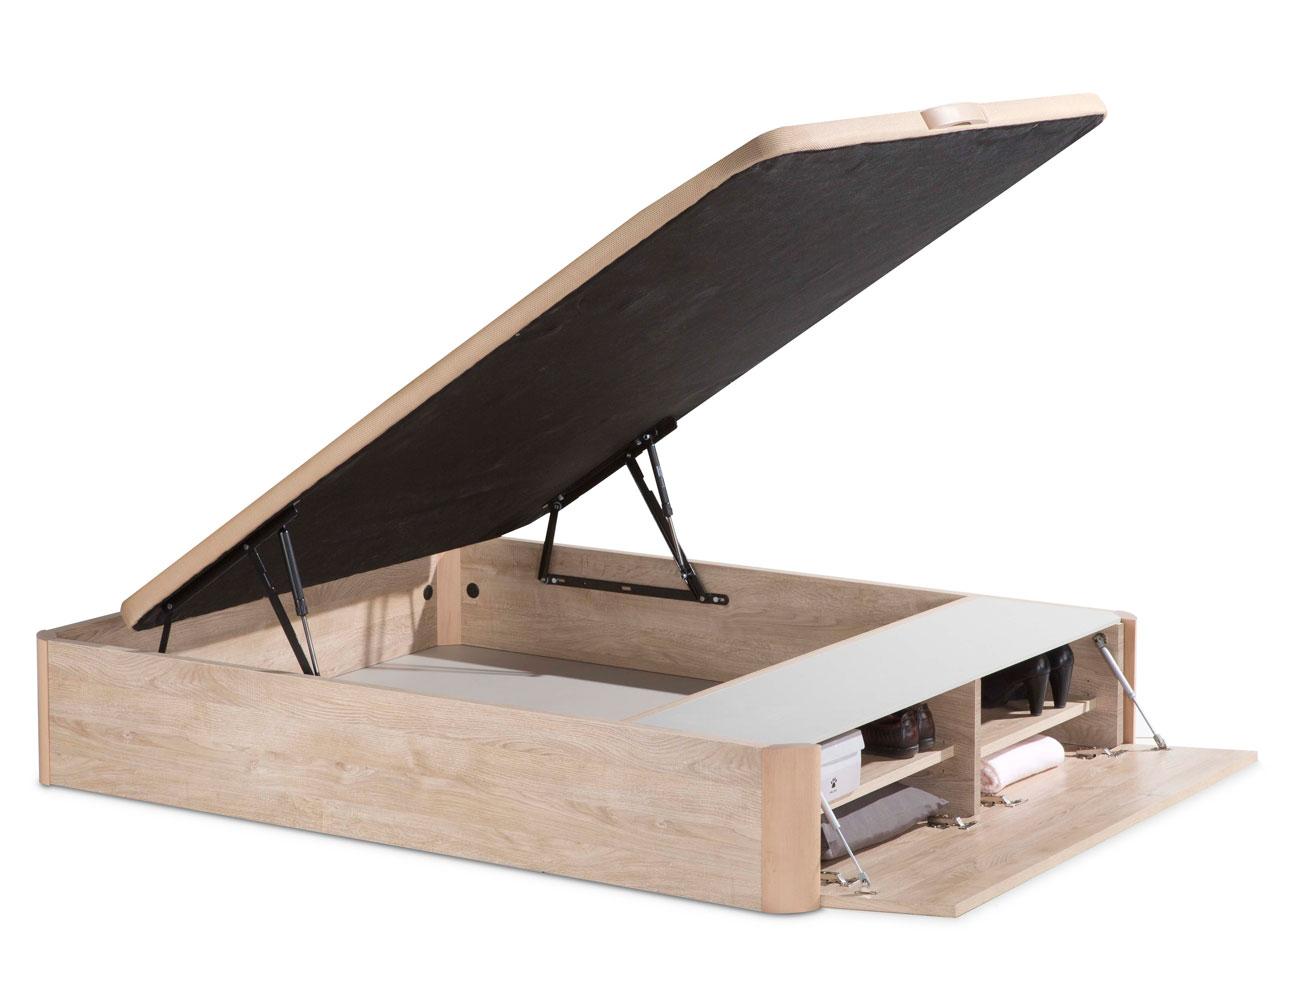 Canape zapatero madera tapa 3d 7611